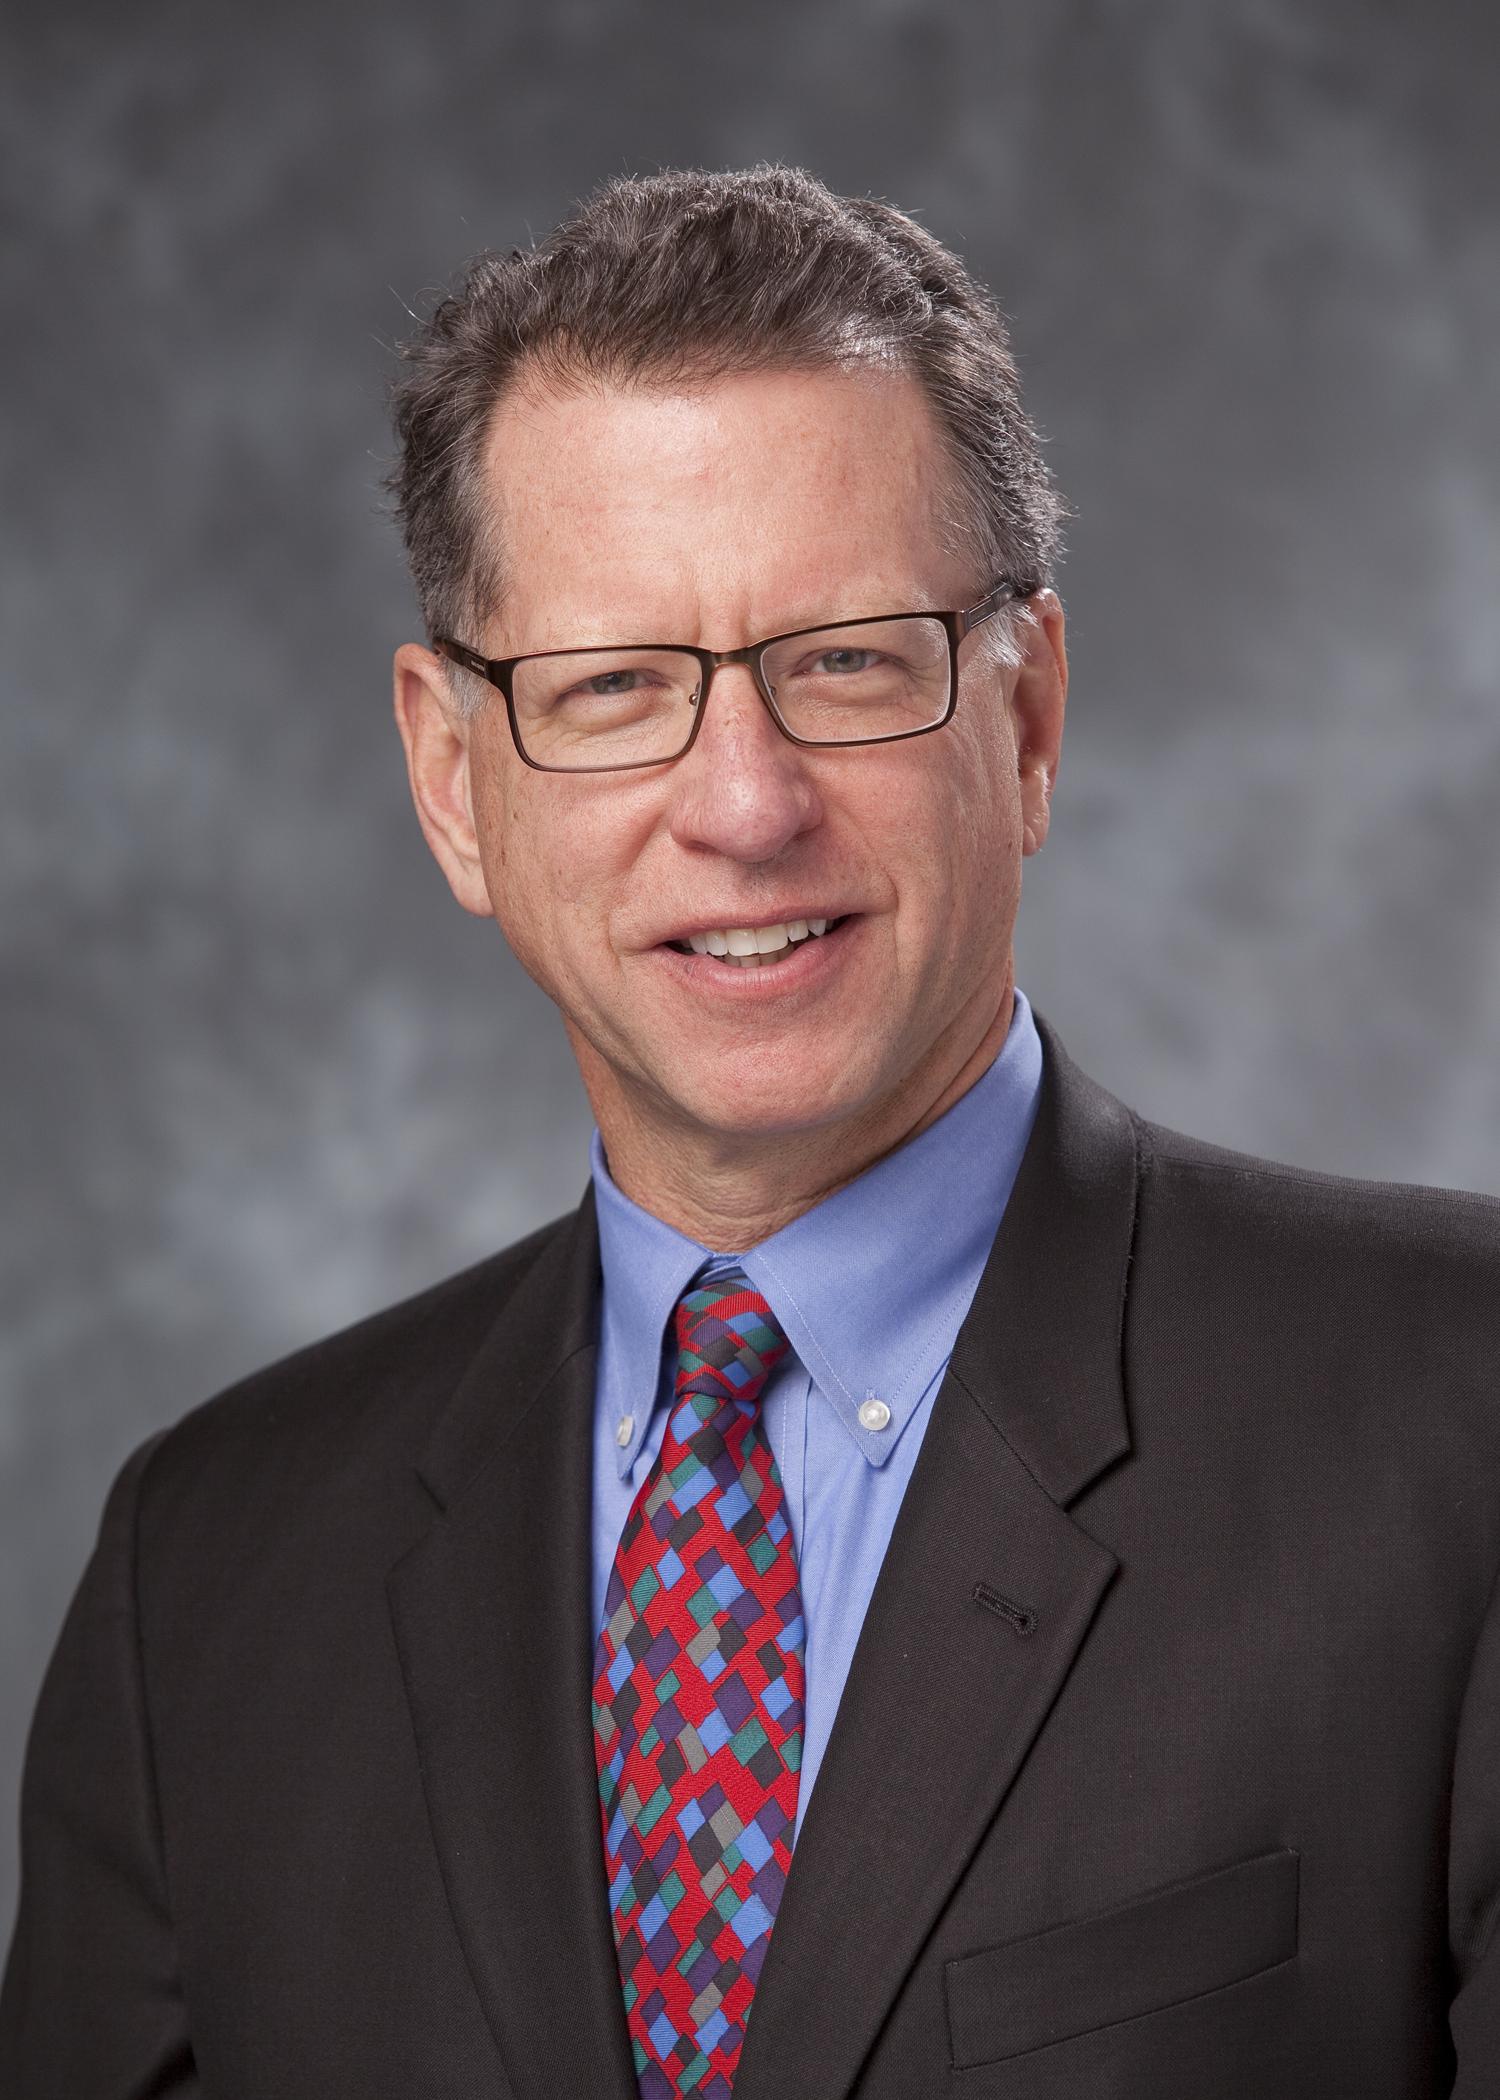 Mike Linton, CMO of Farmers Insurance